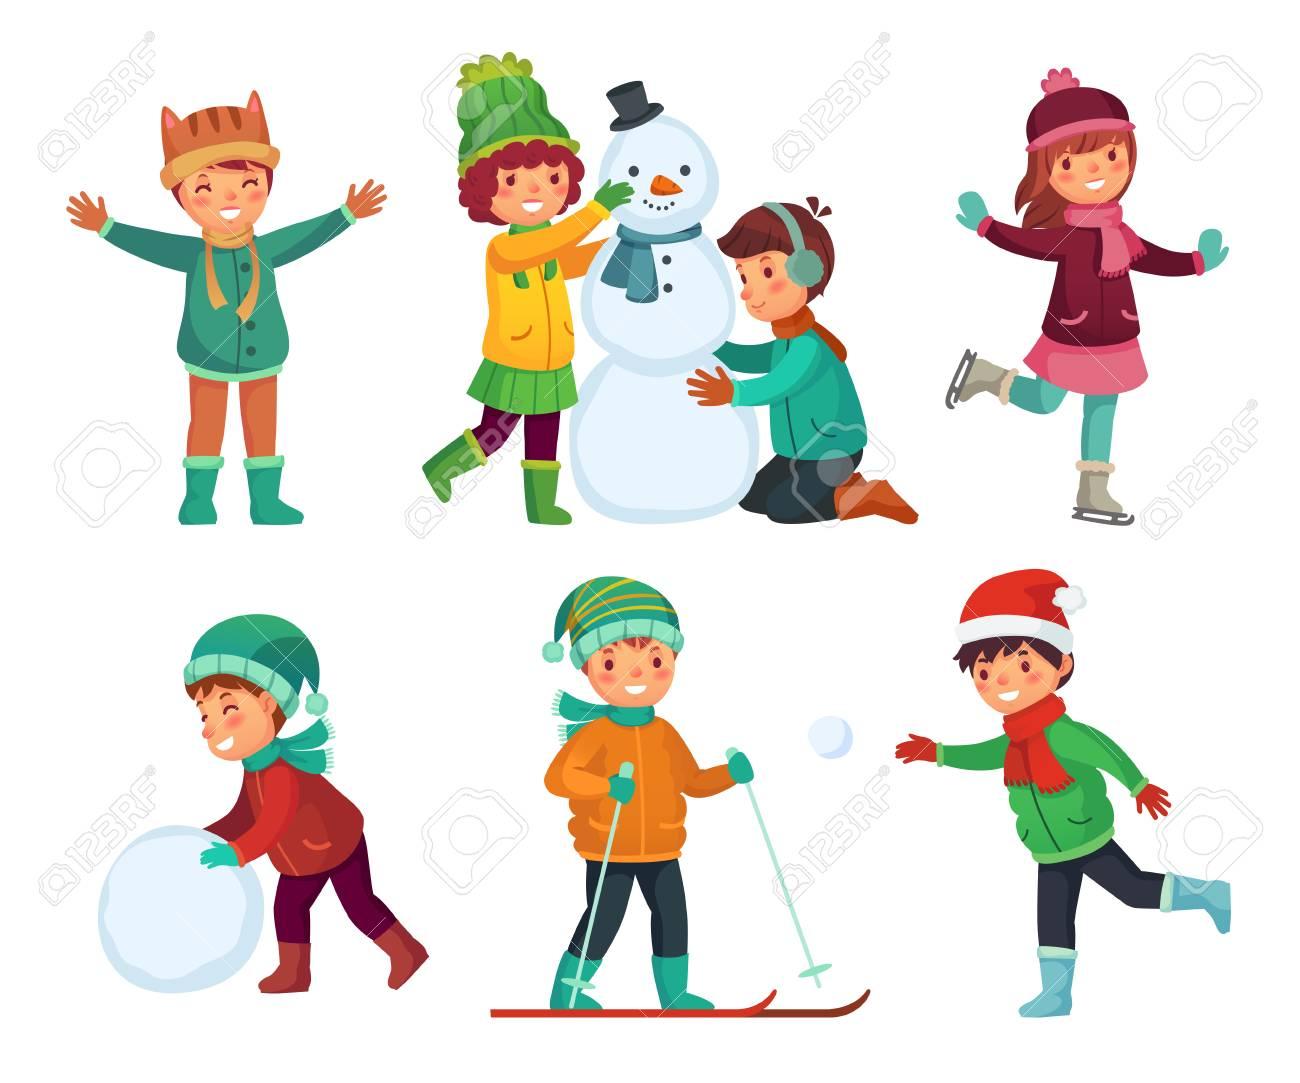 Happy Kids Winter Activities Children Playing With Snow Cartoon